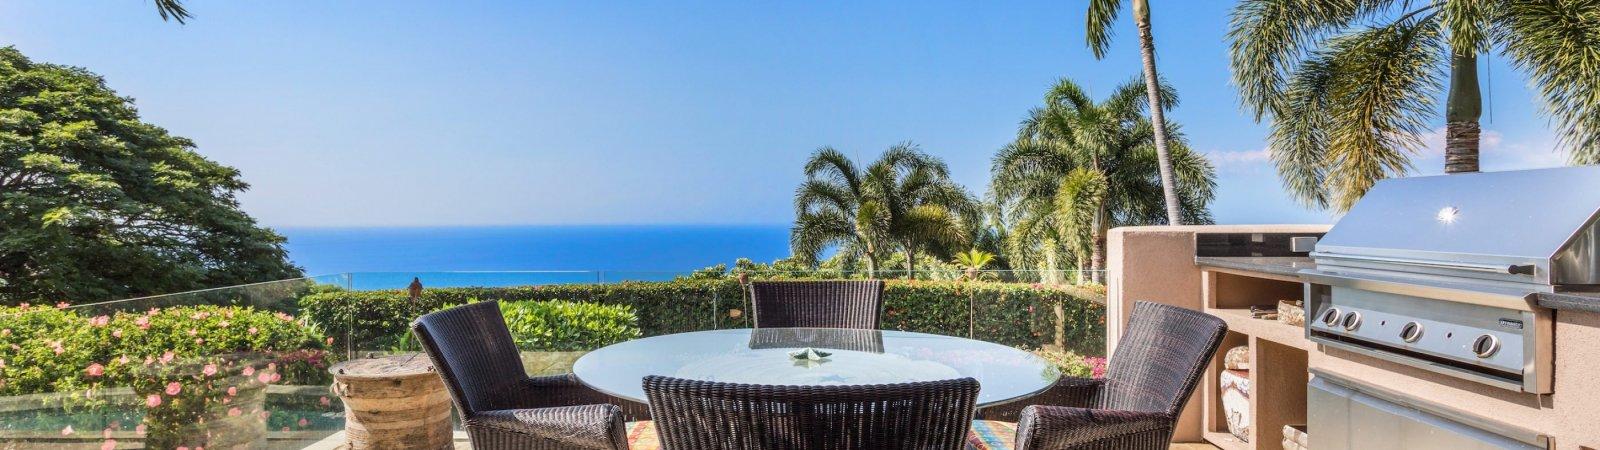 Big Island Shared Ownership Properties